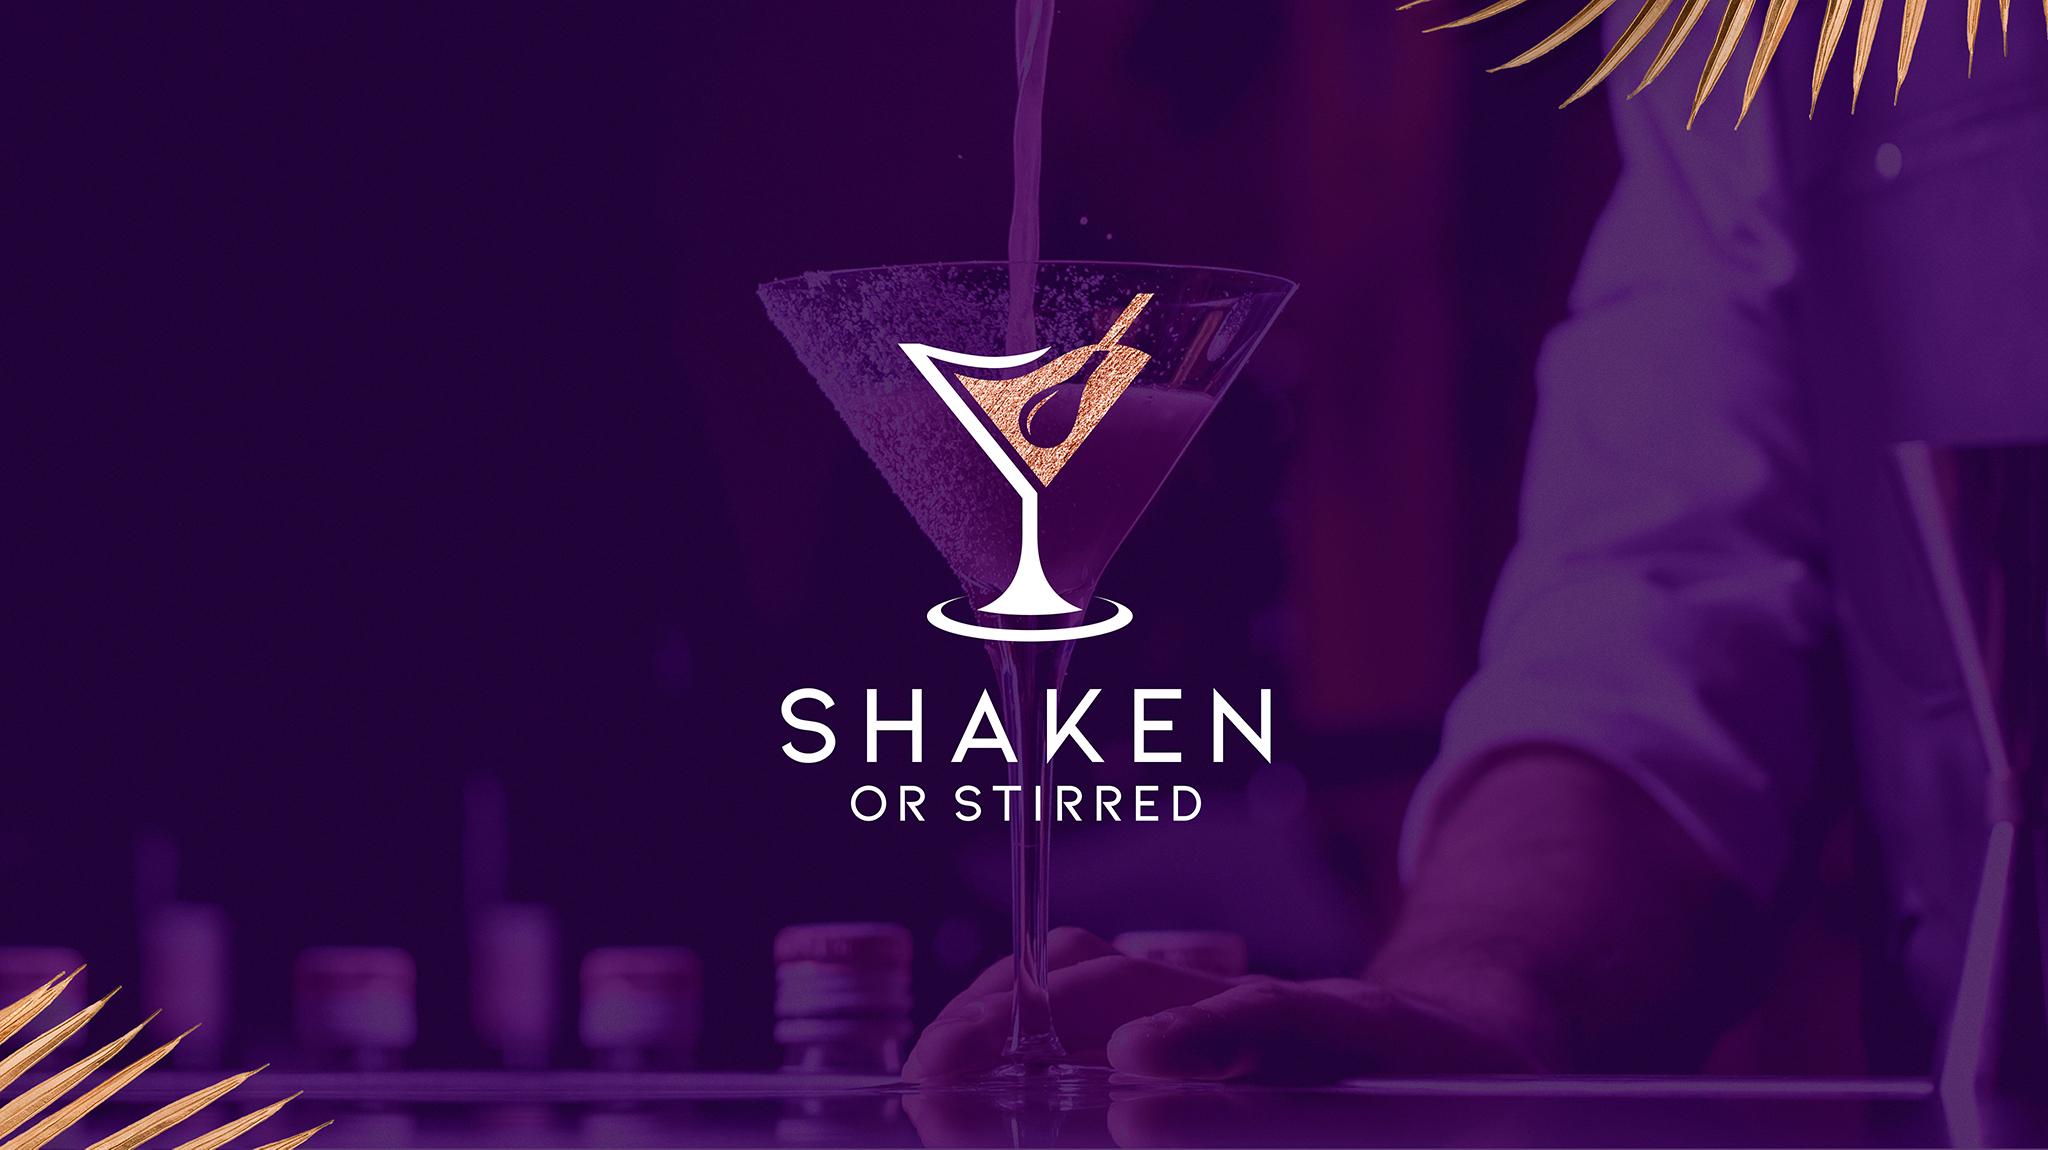 Shaken or Stirred | Get #1 Branding Your Business | Branding Agency Branding